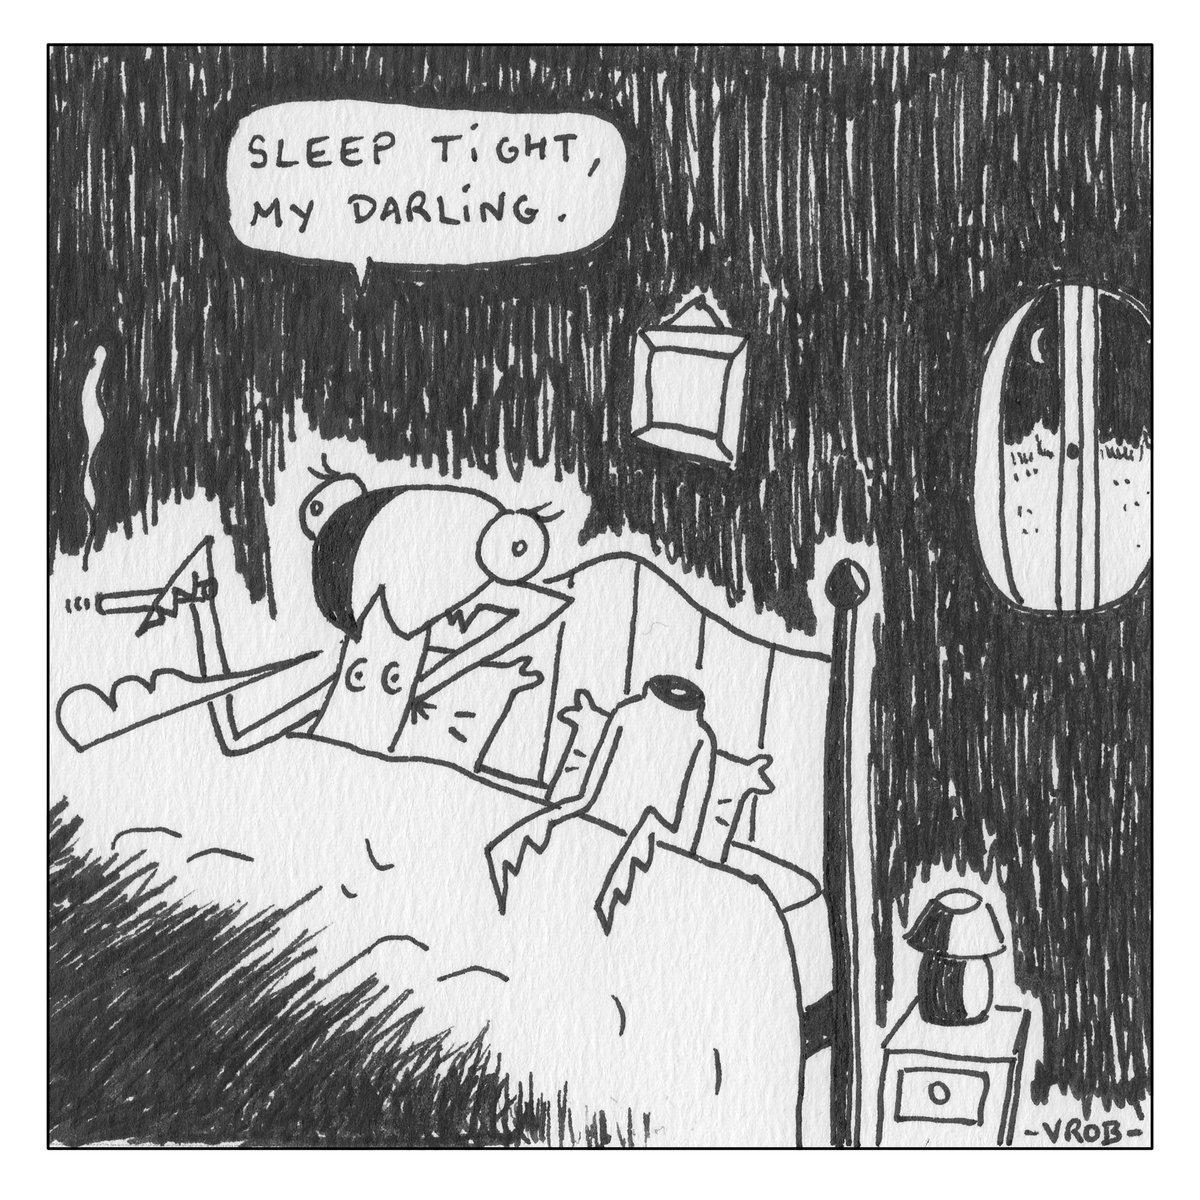 #wtfctober & #inktober  21 - Insect & Sleep . . . #inktober2020 #ink #wtf #dessin #drawing #illustrator #illustration #traditionalart #inktobersleep #inktober2020sleep #sleep #insect #mantis https://t.co/6mZCItkJPY